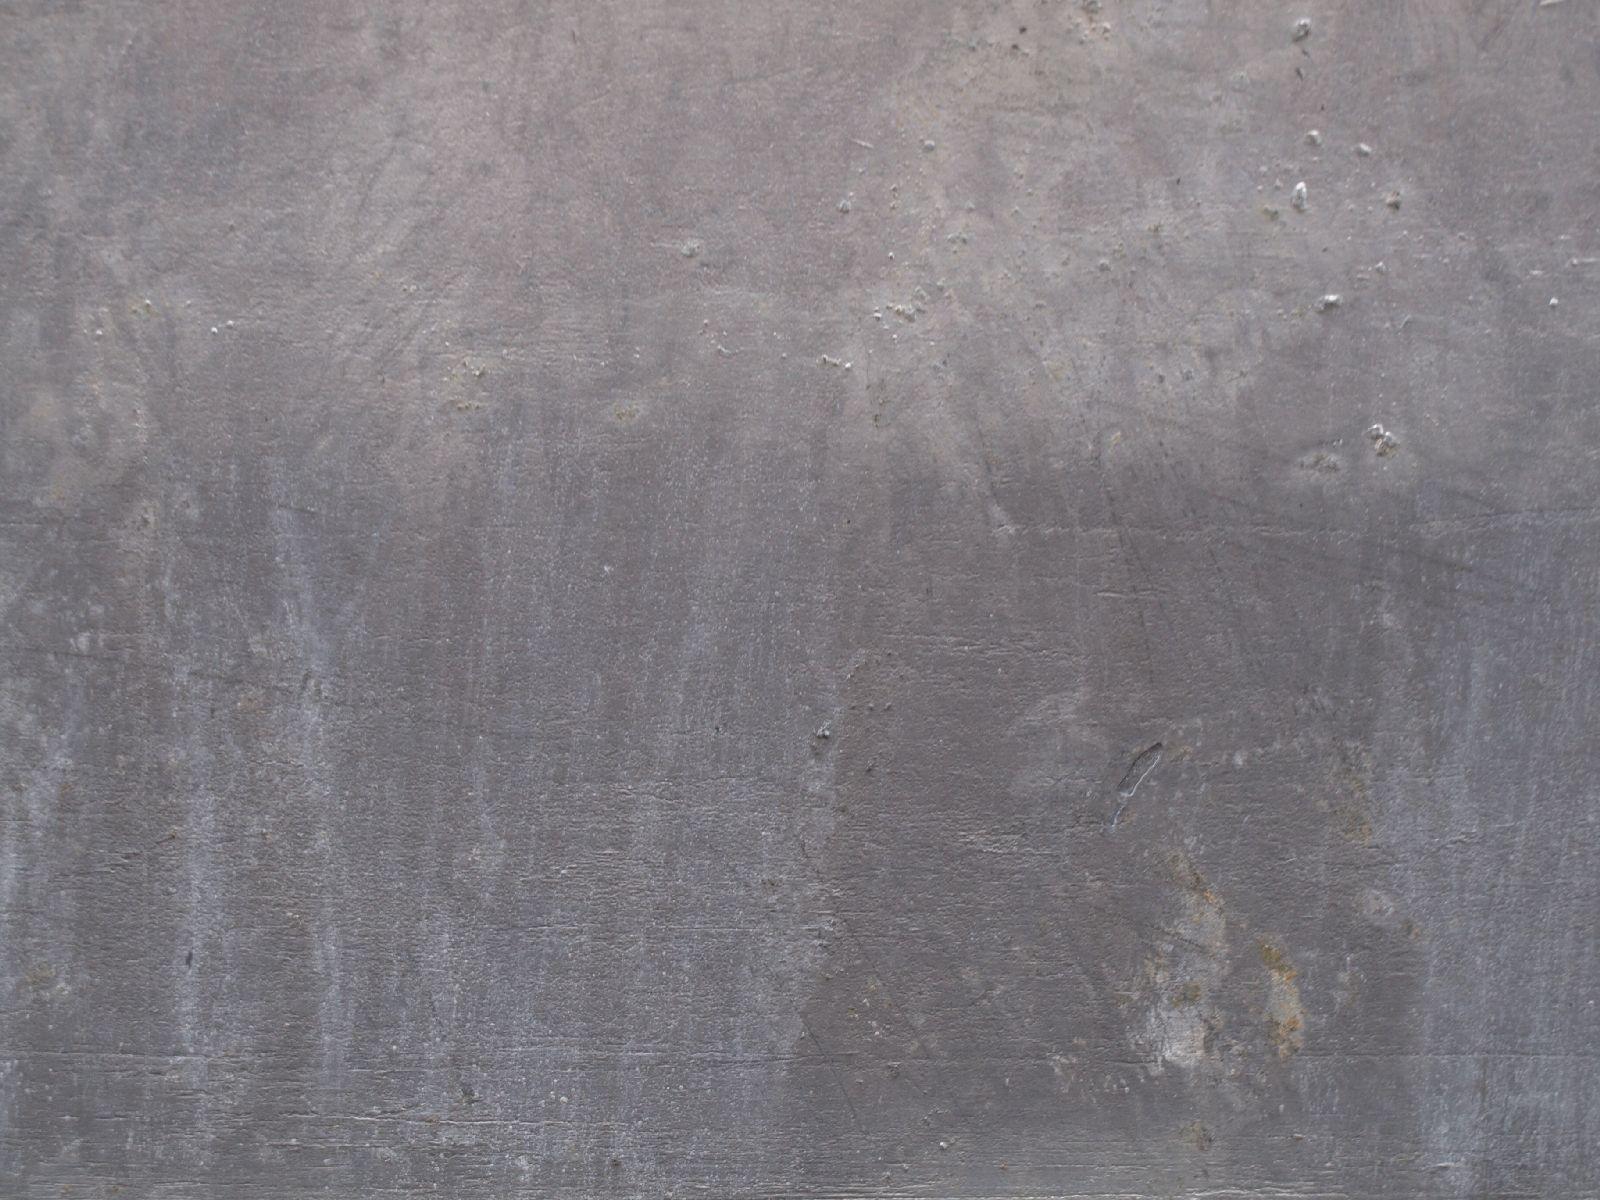 Metall_Textur_A_P4131211